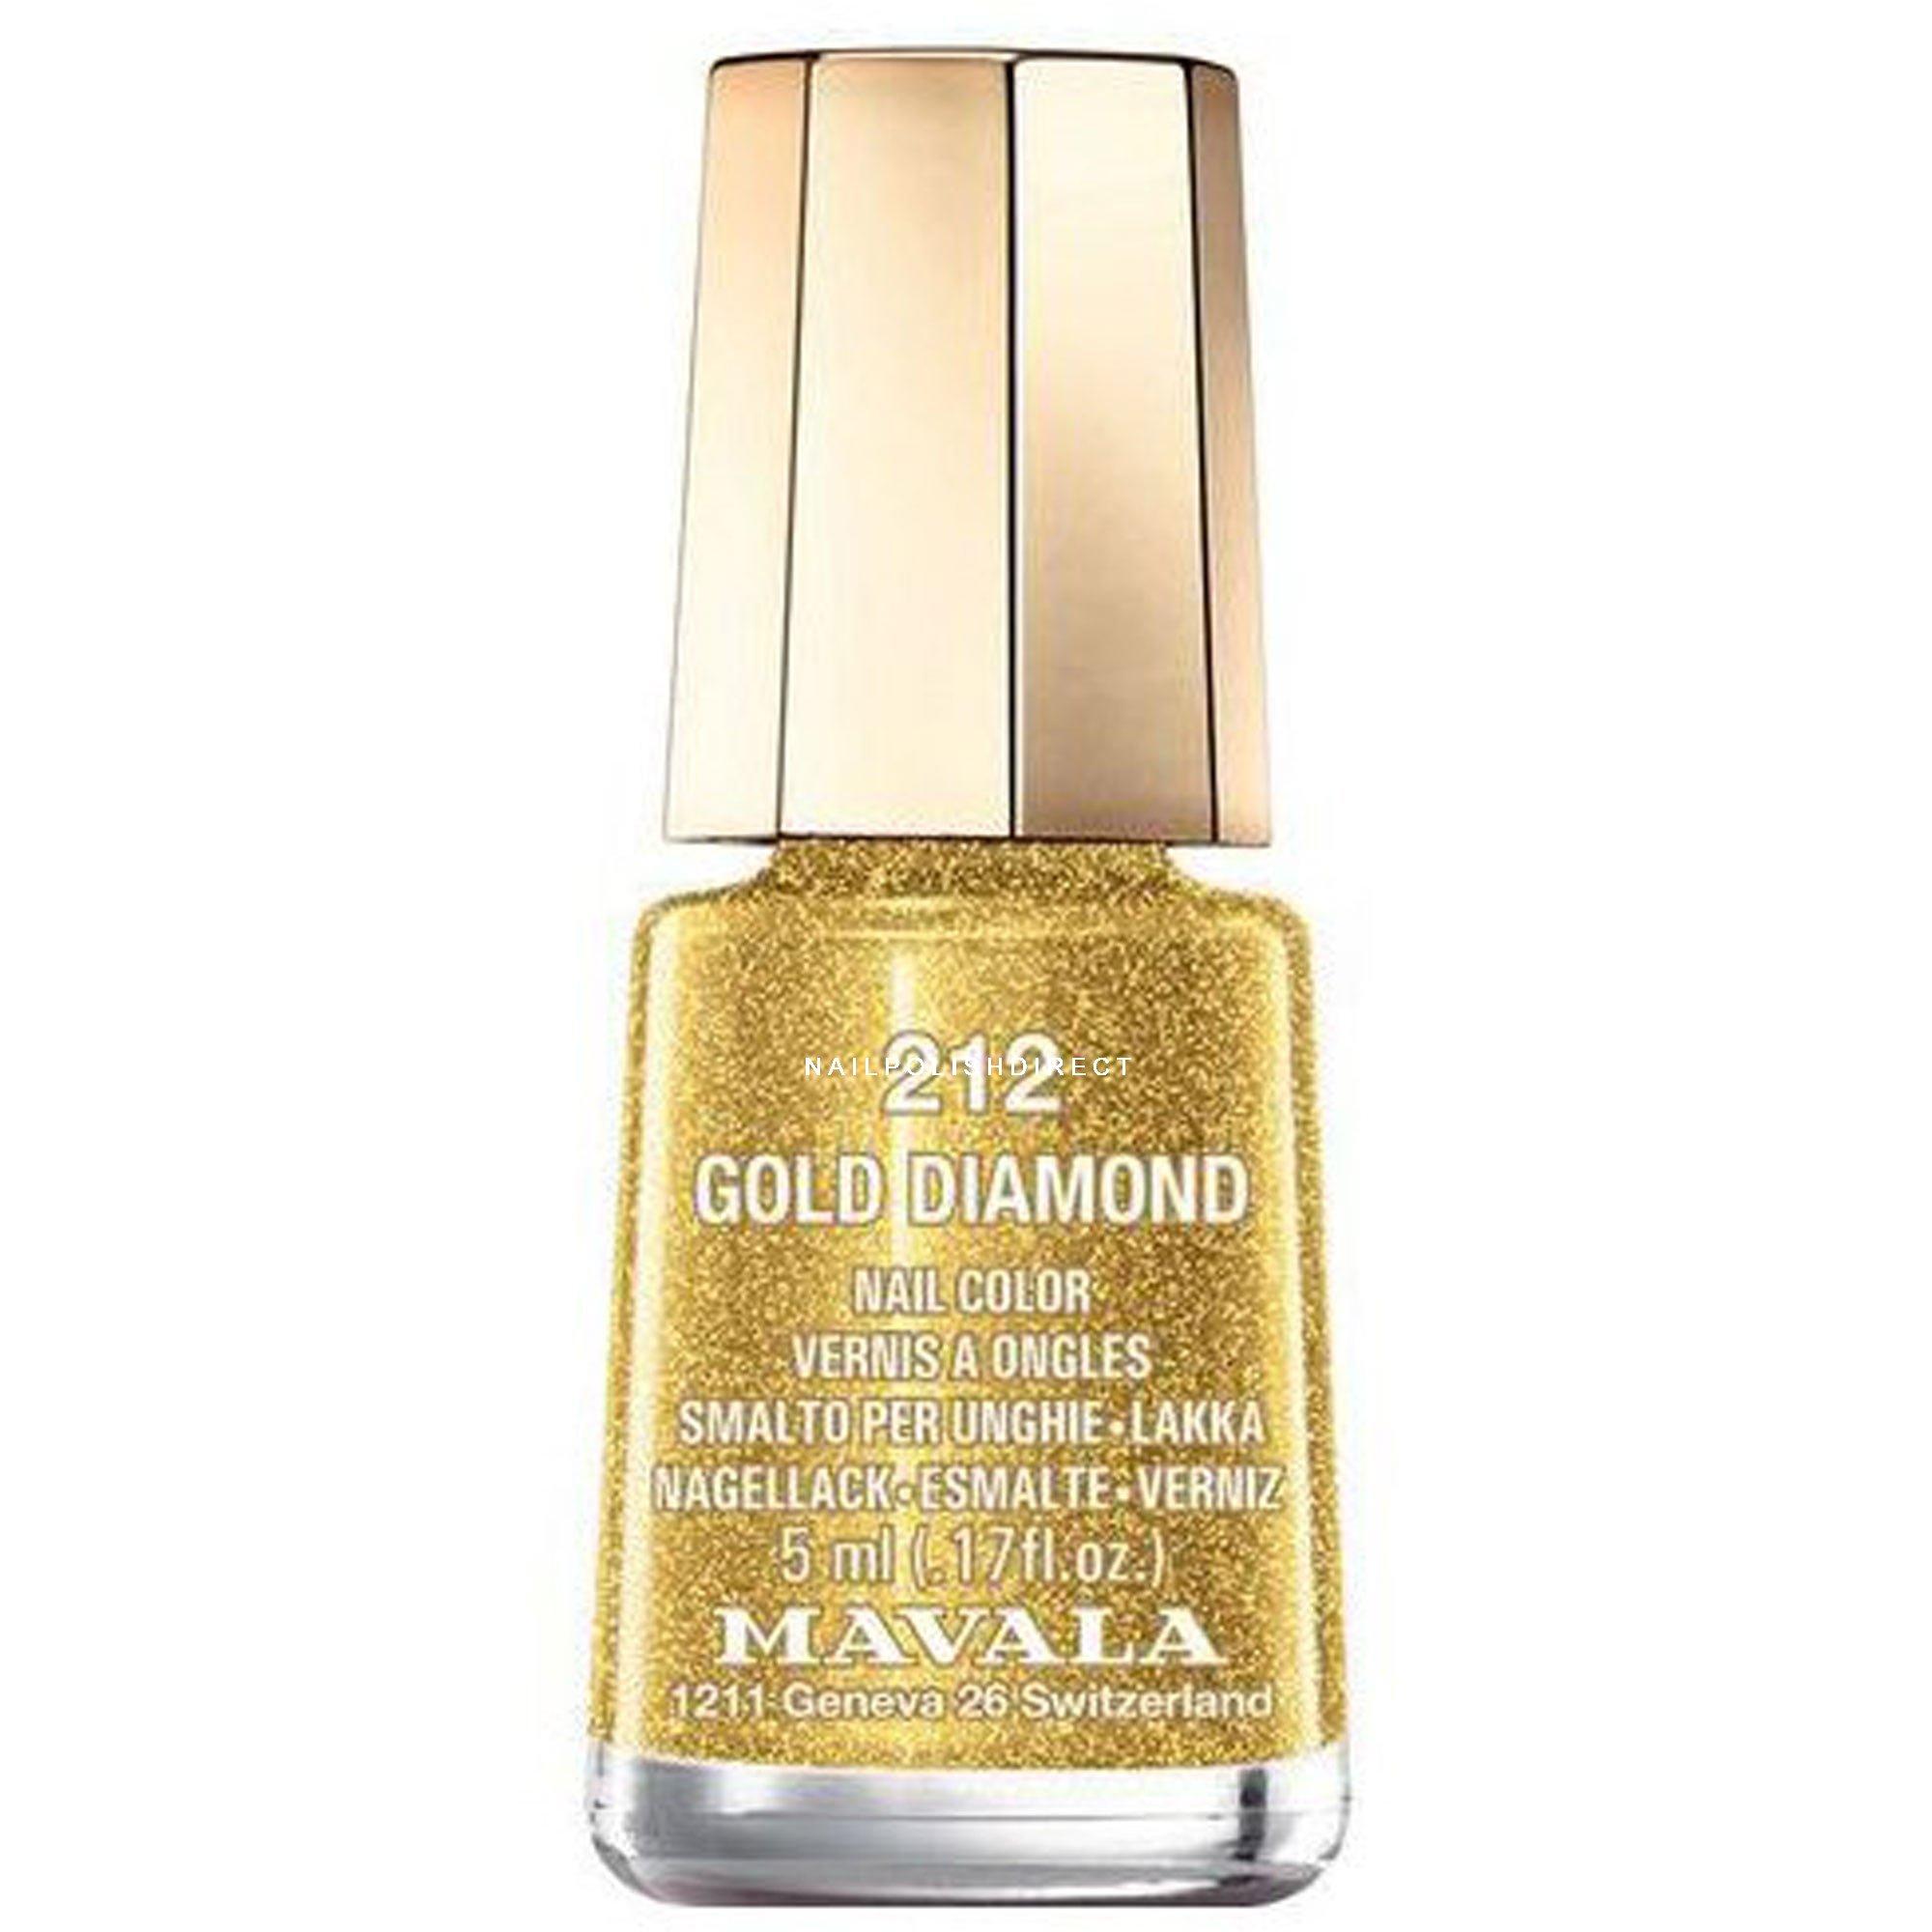 Mavala Mini Color Creme Polish Gold Diamond At Nail Polish